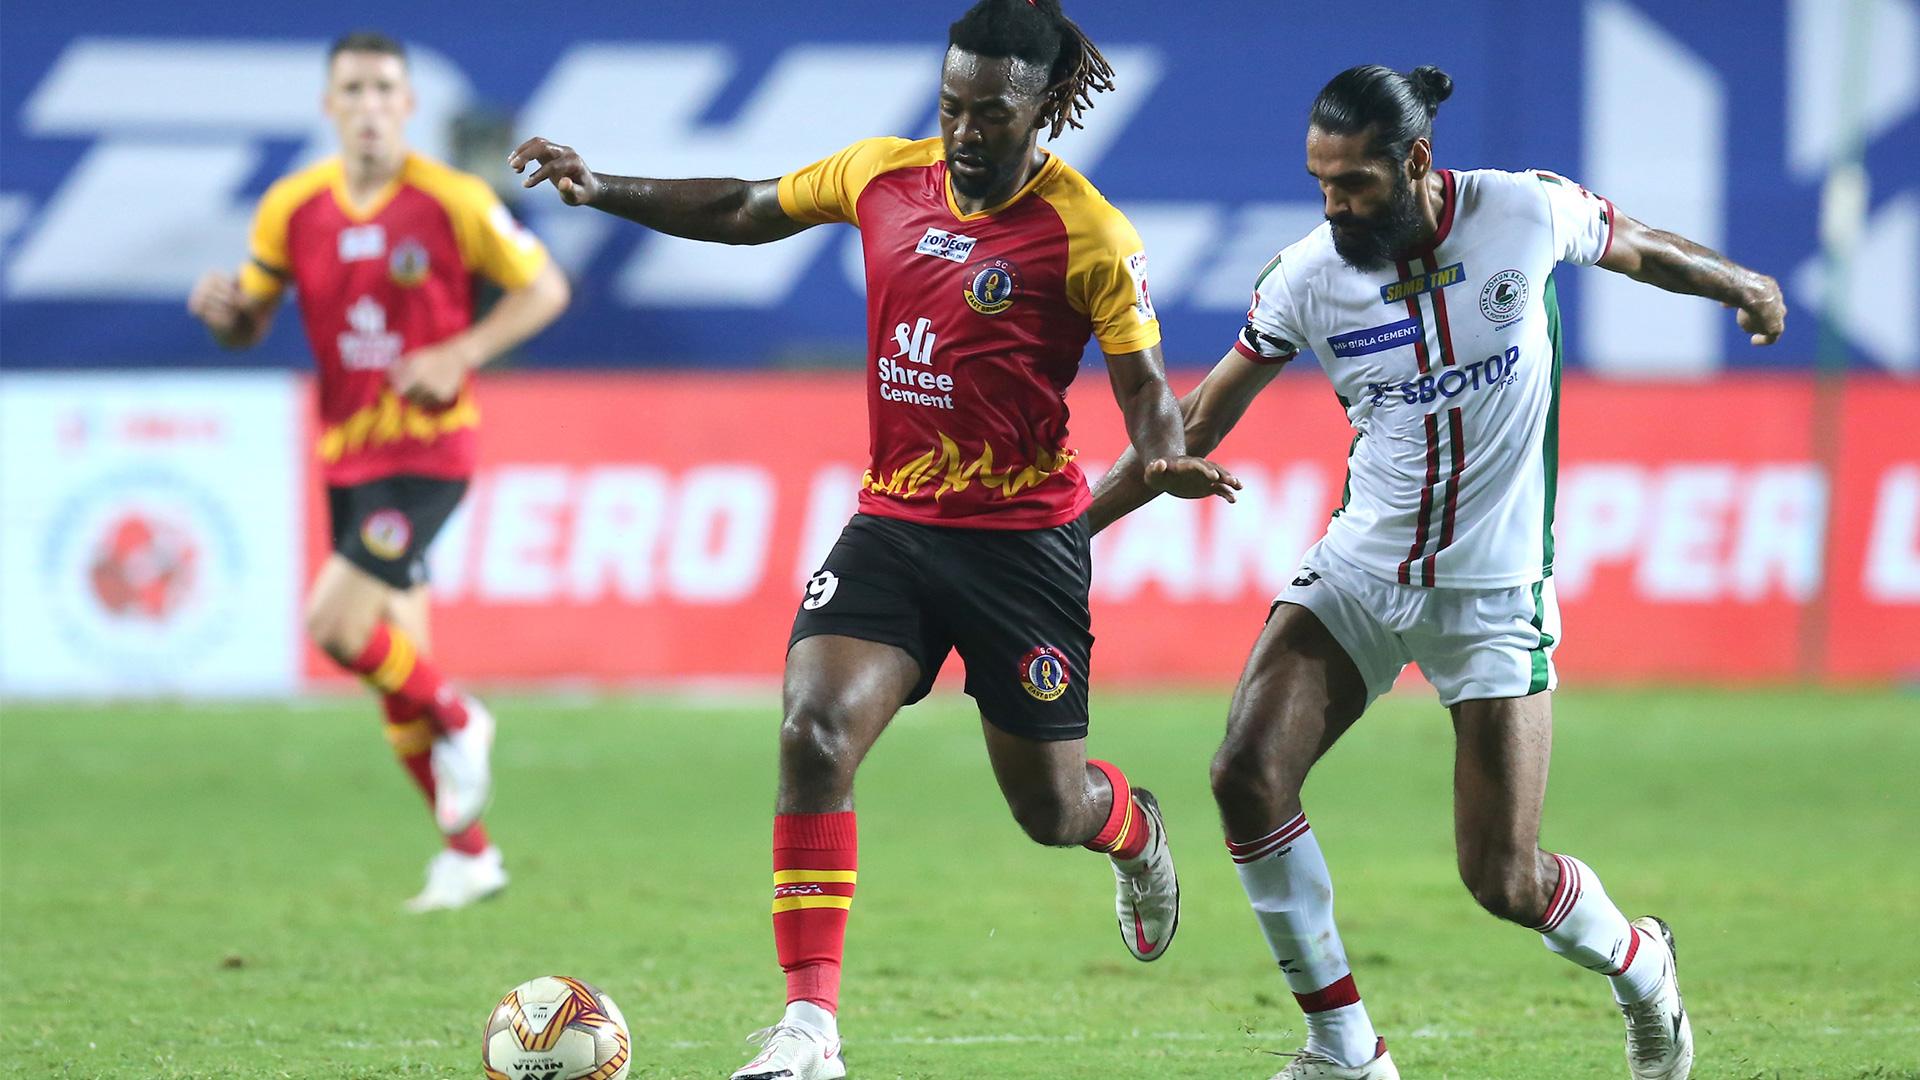 East Bengal v ATK Mohun Bagan Match Report, 27/11/20, Indian Super League |  Goal.com